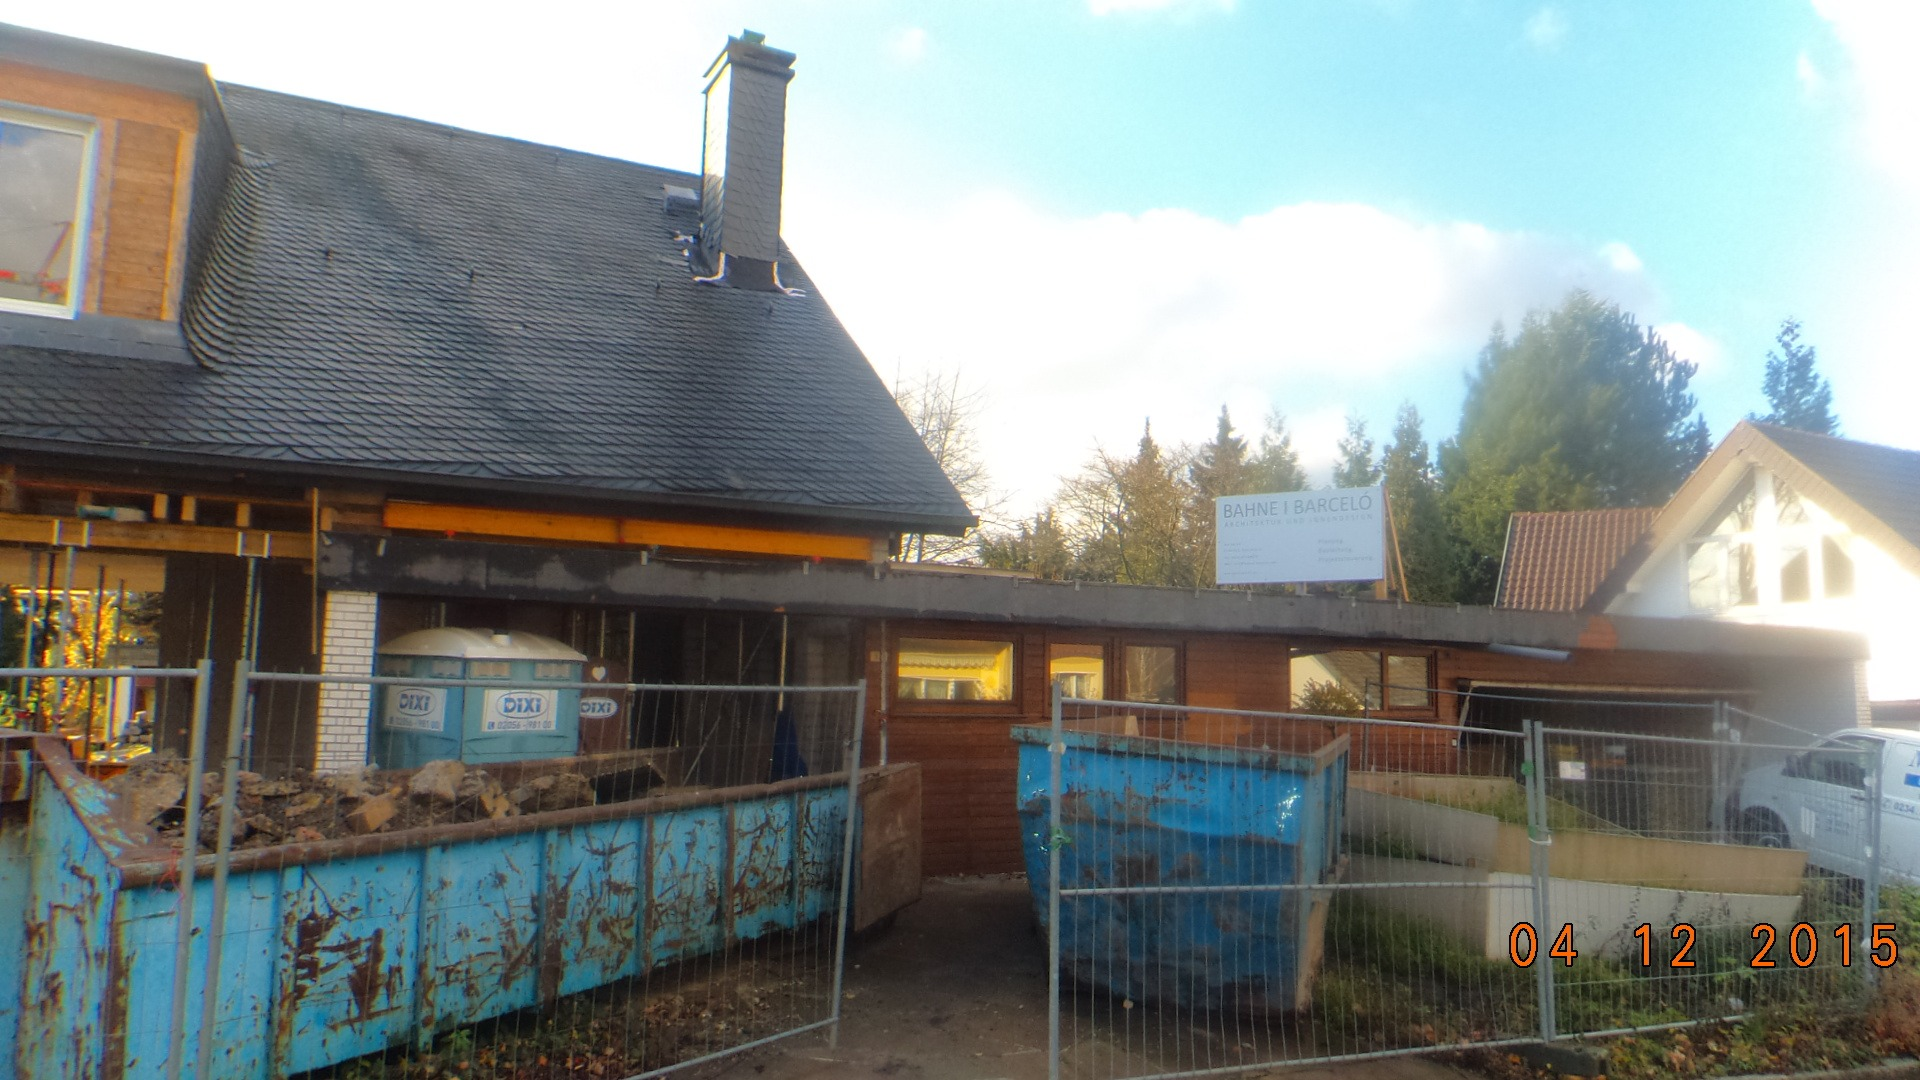 Umbau Einfamilienhaus Dortmund-Kirchhörde_Bauschild